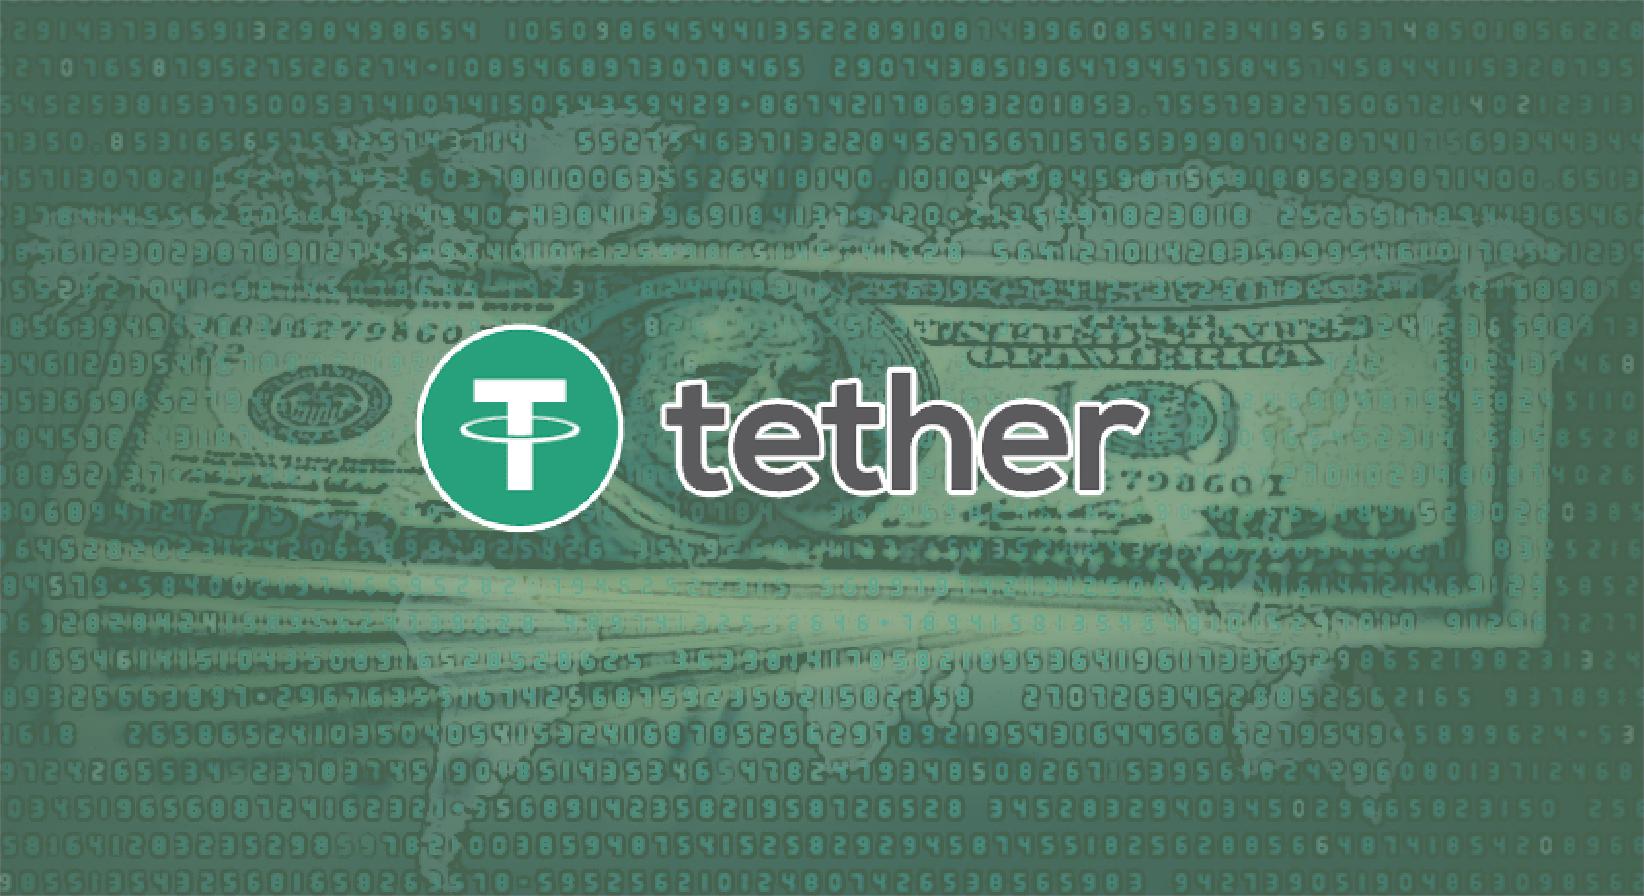 Tether's market valuation exceeds $10B